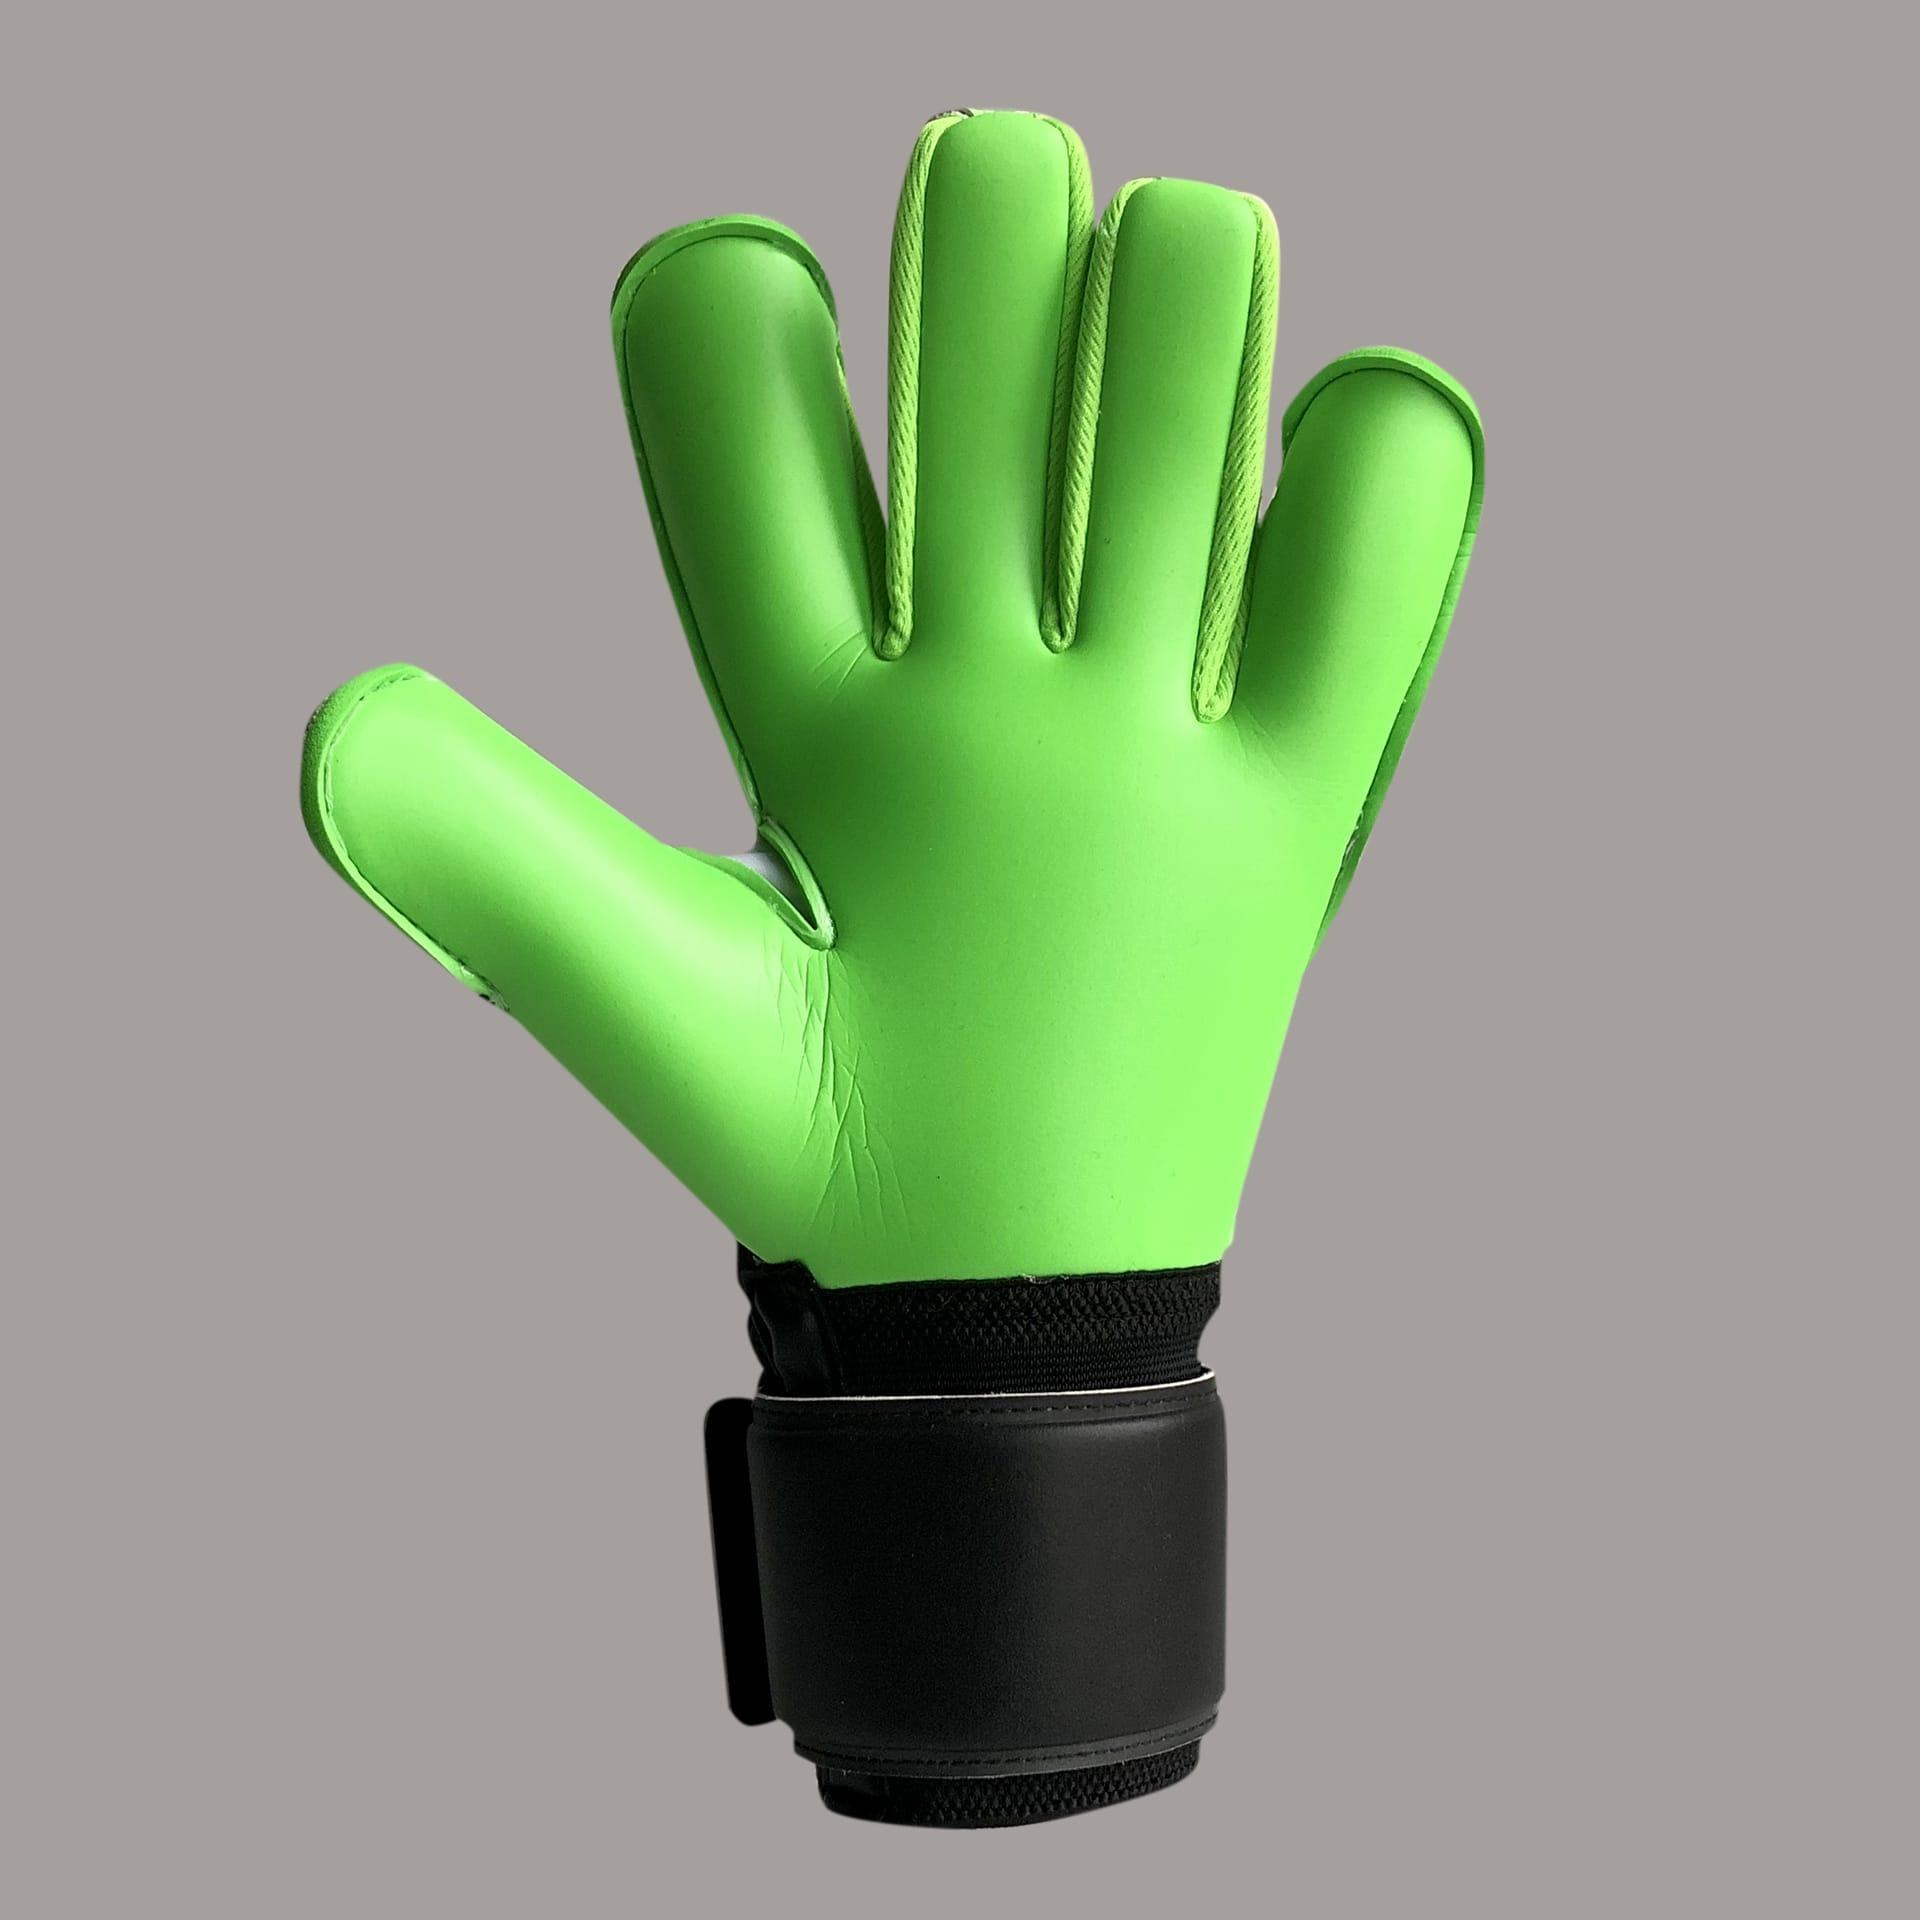 Вратарские перчатки Brave GK Skill Green Flash - официальный интернет-магазин Brave GK